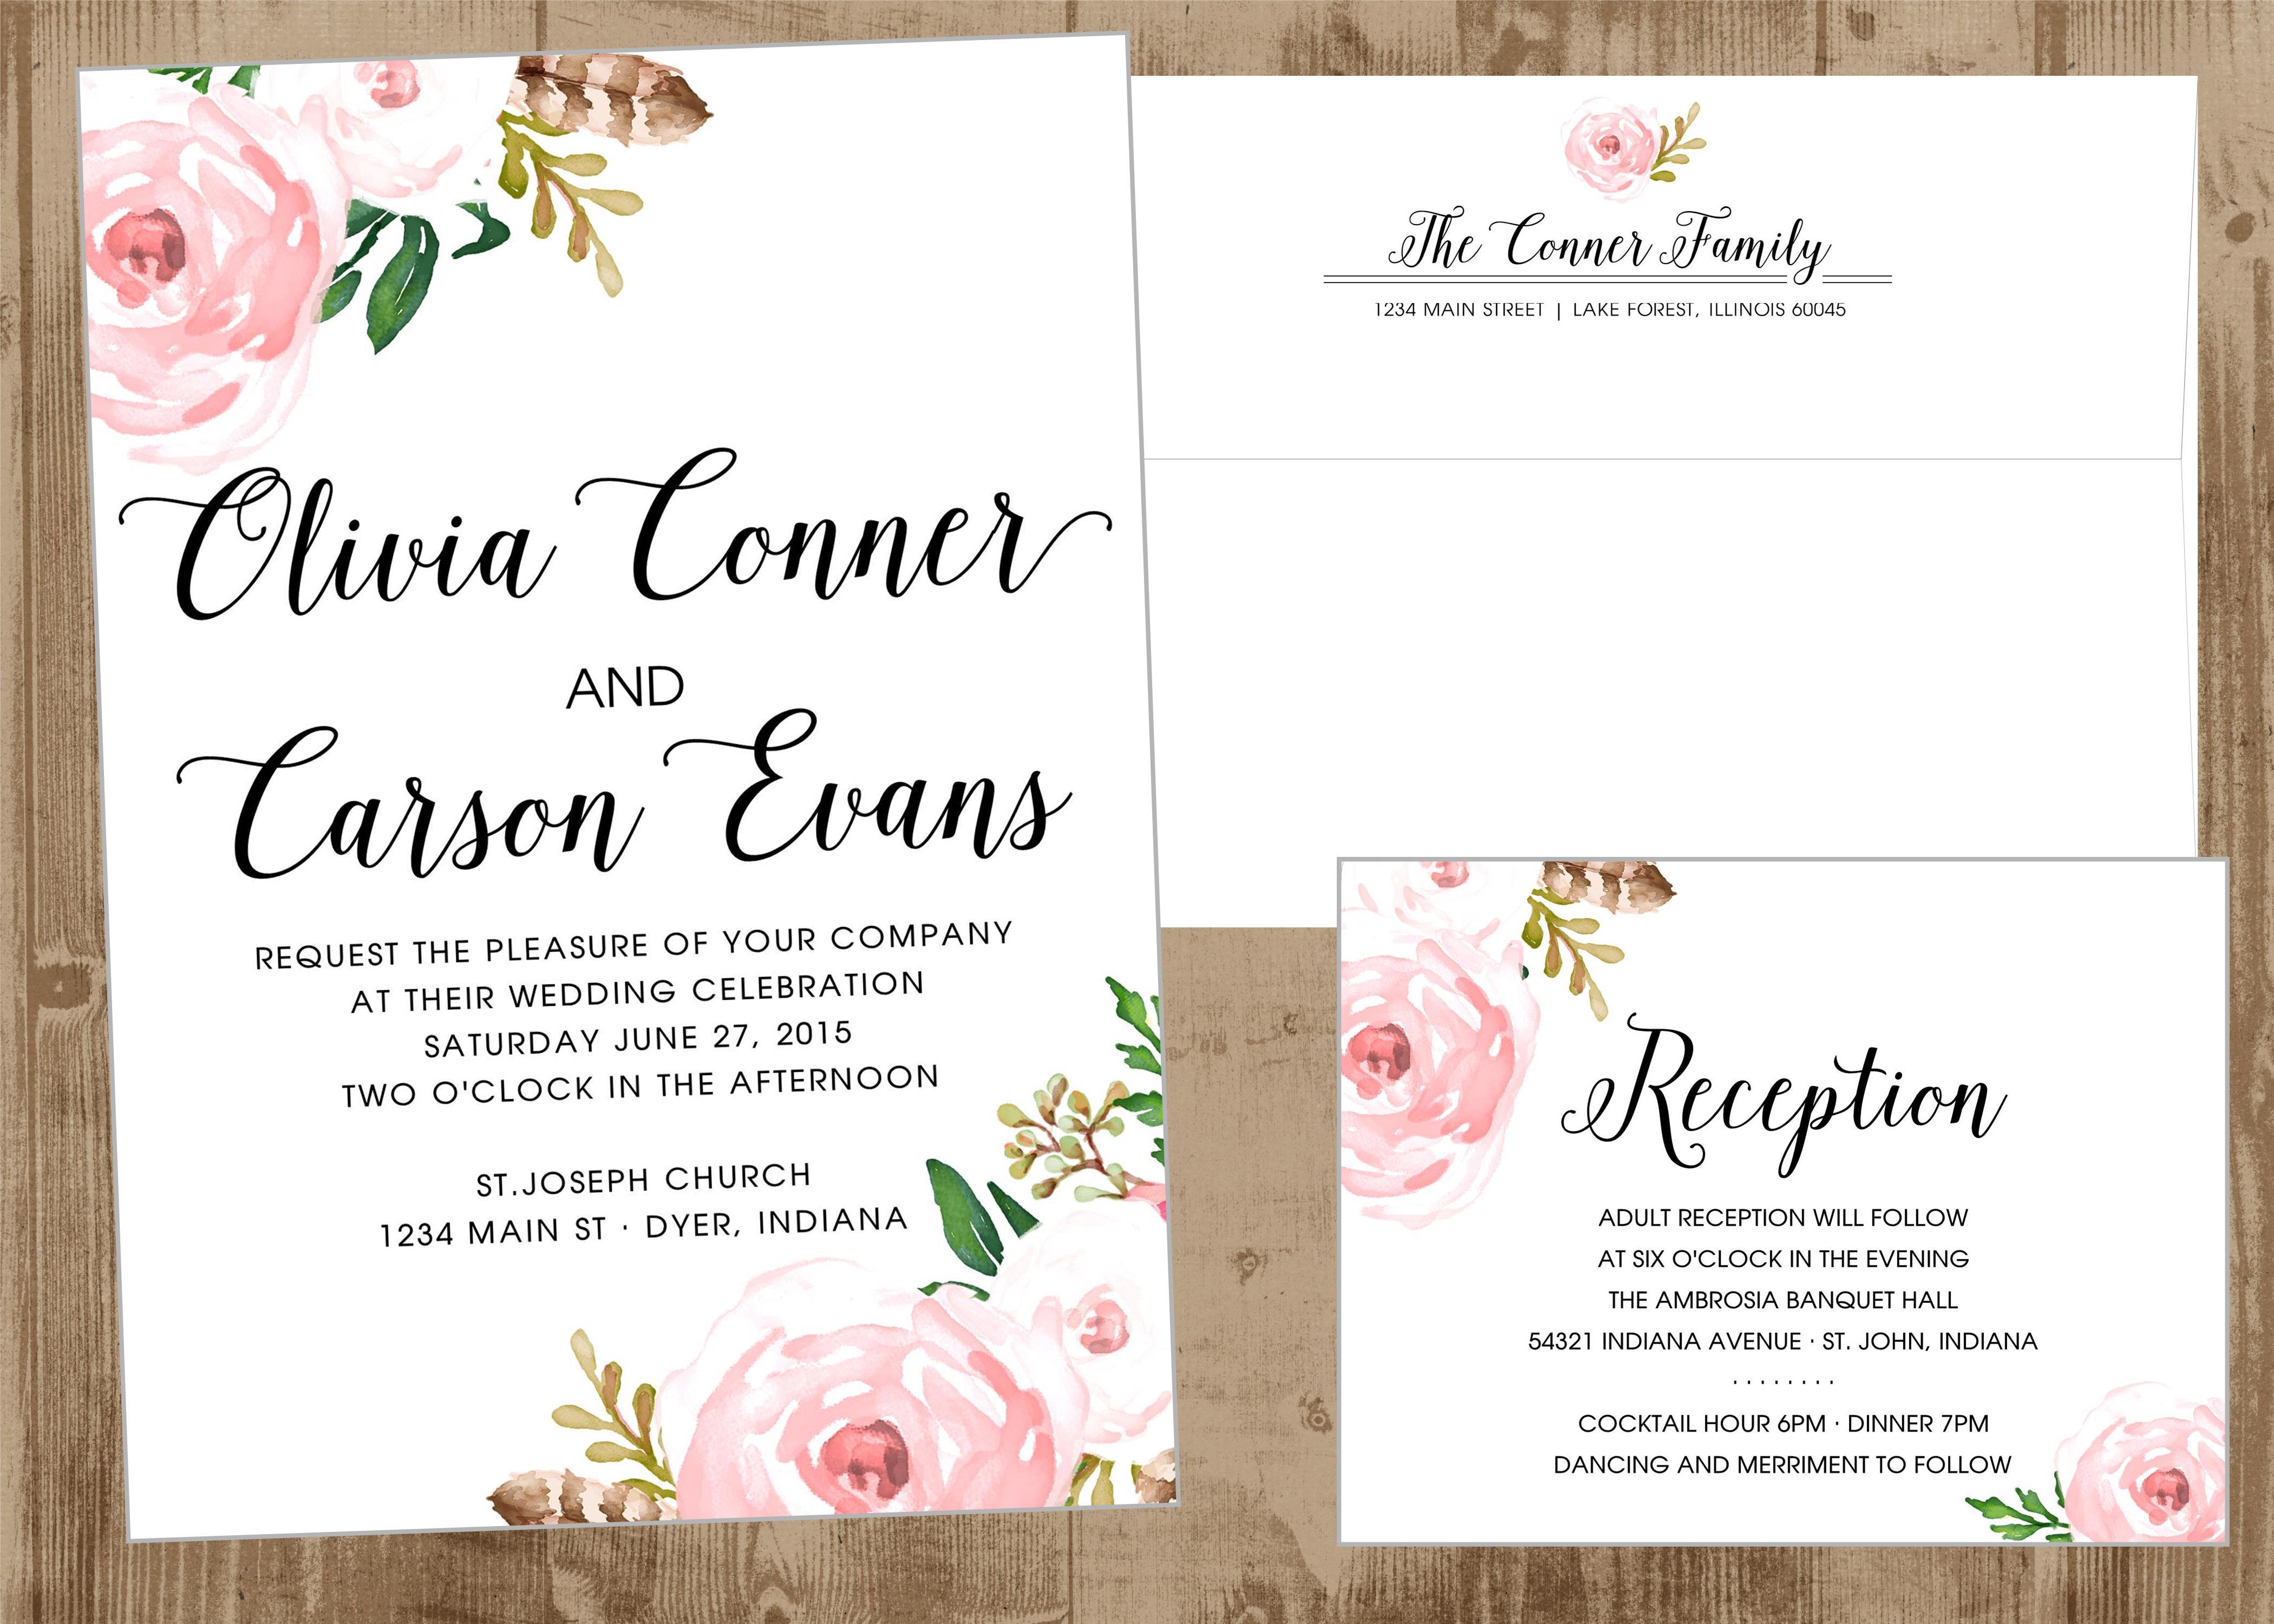 Sample Wording For Wedding Invitation: Printable Wedding Invitation Suite With Vintage Pink